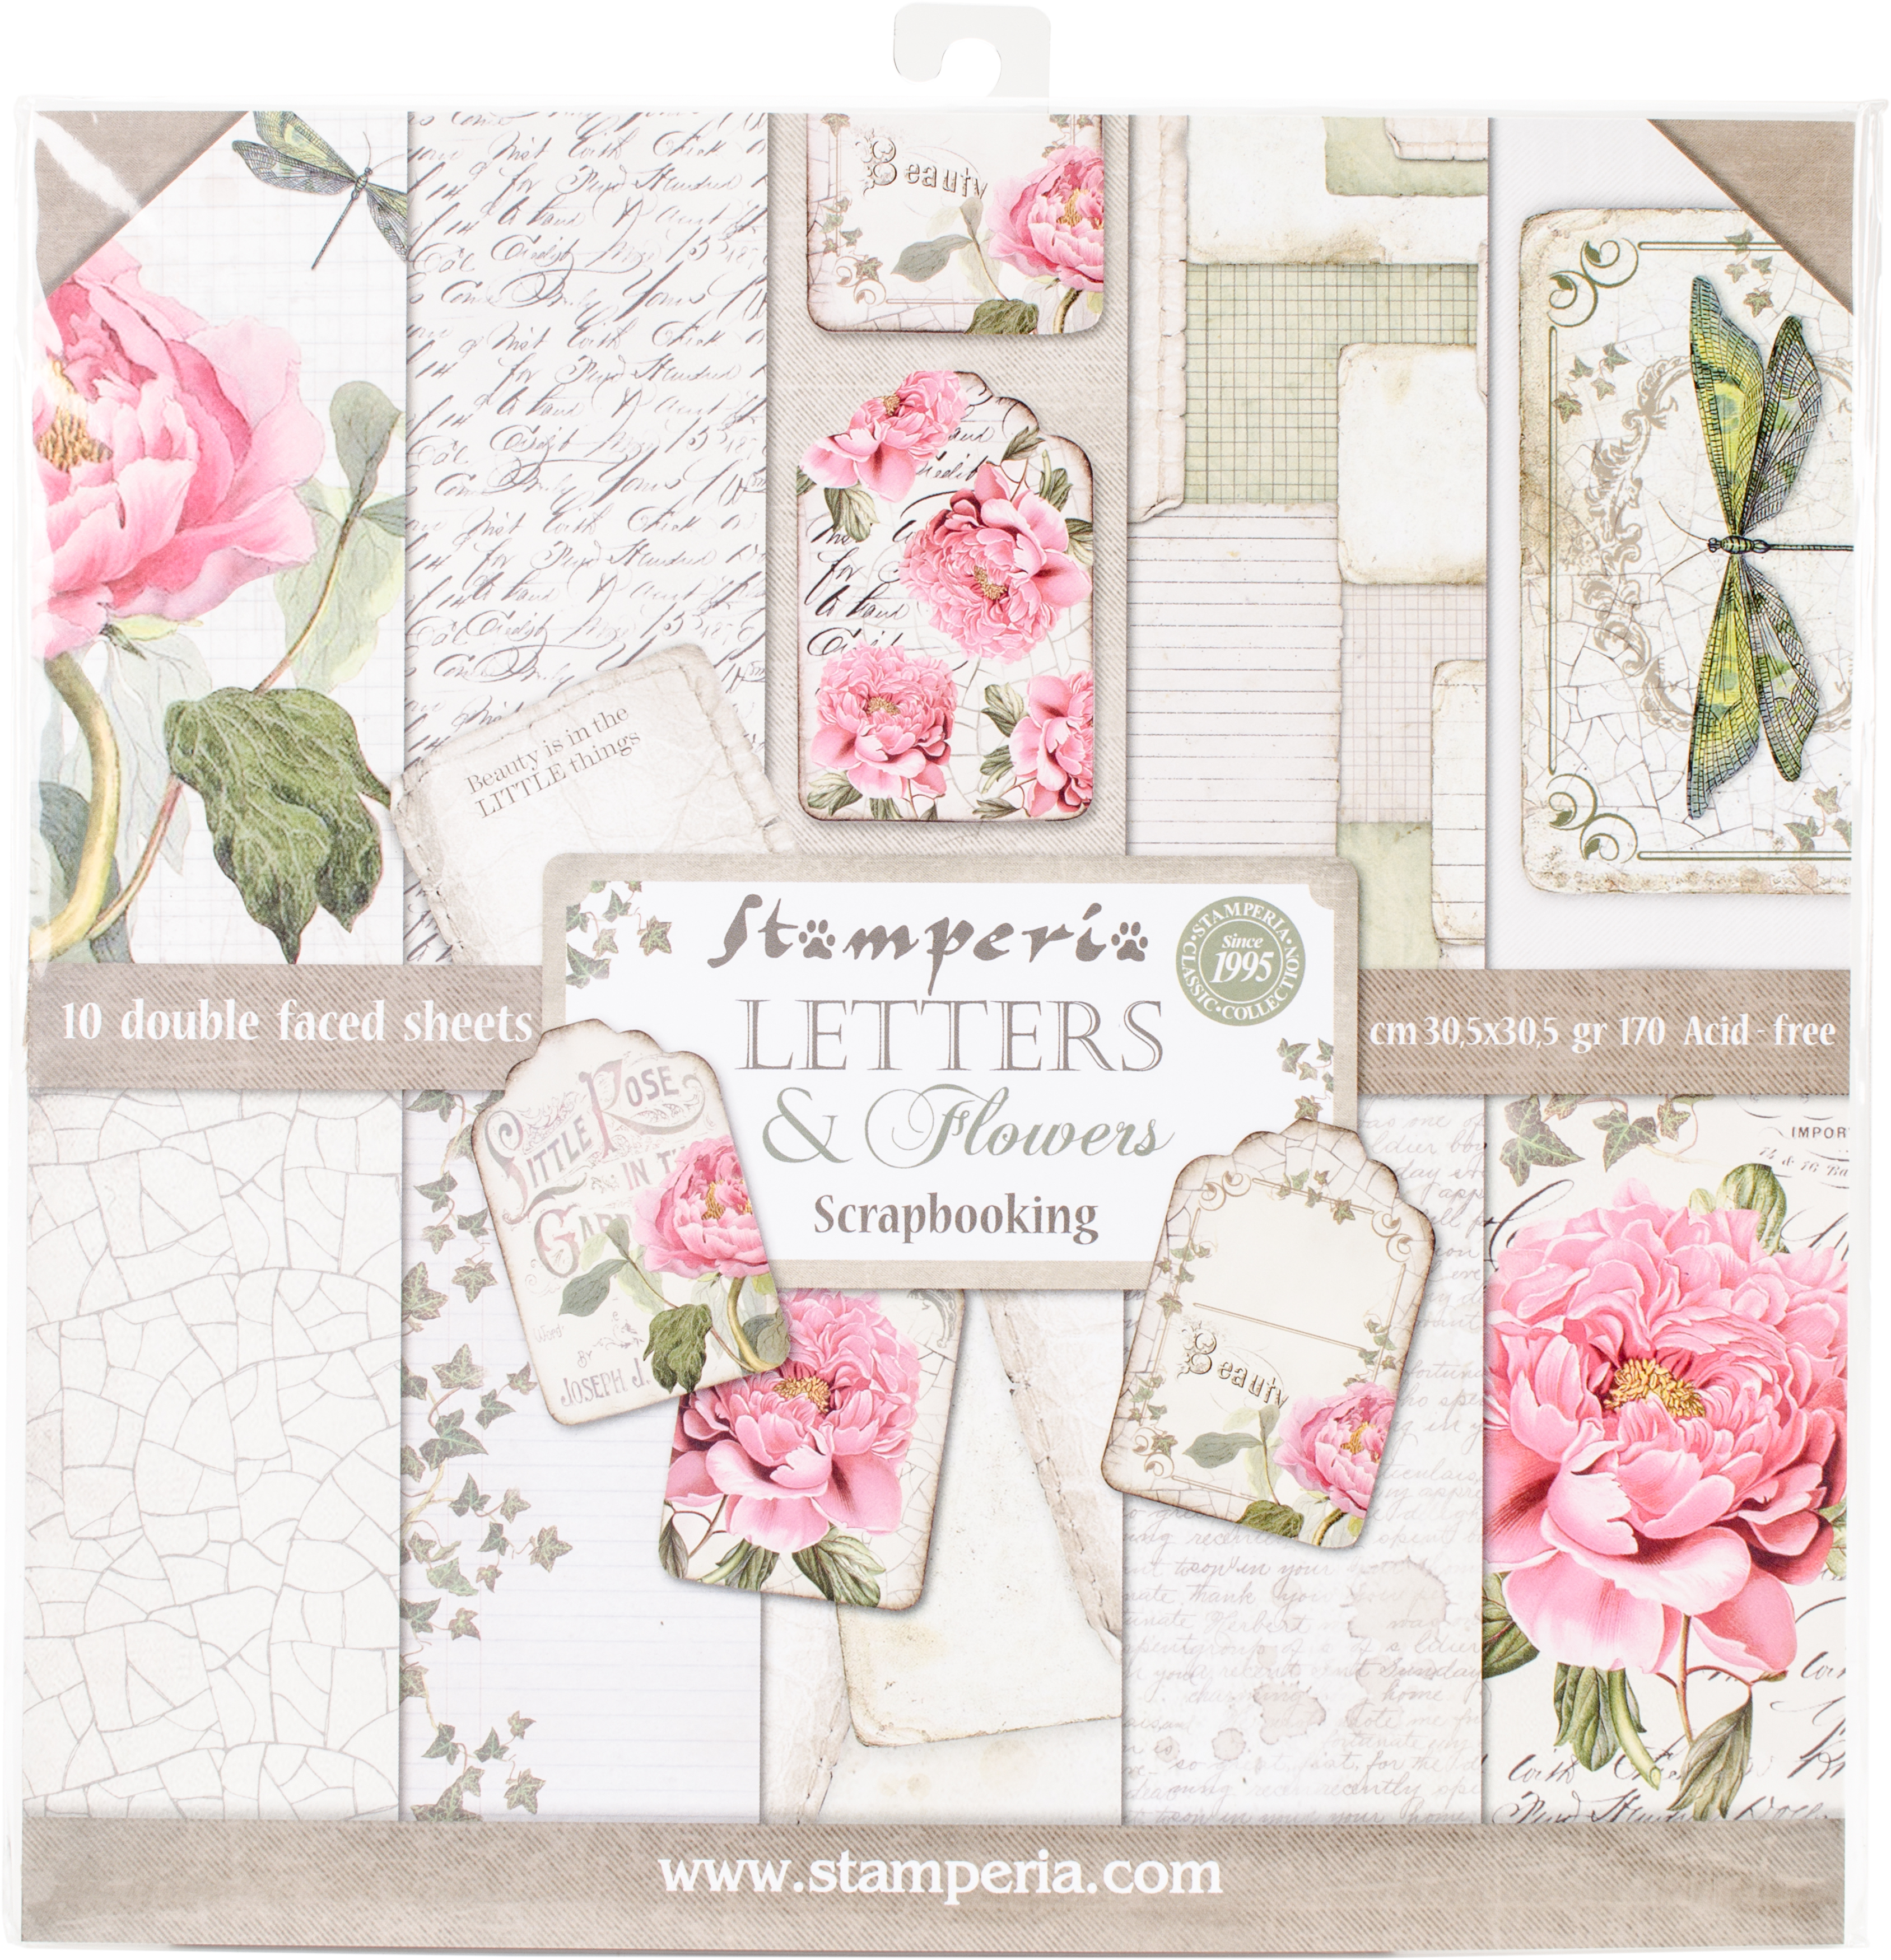 PPRP - LETTERS & FLOWERS